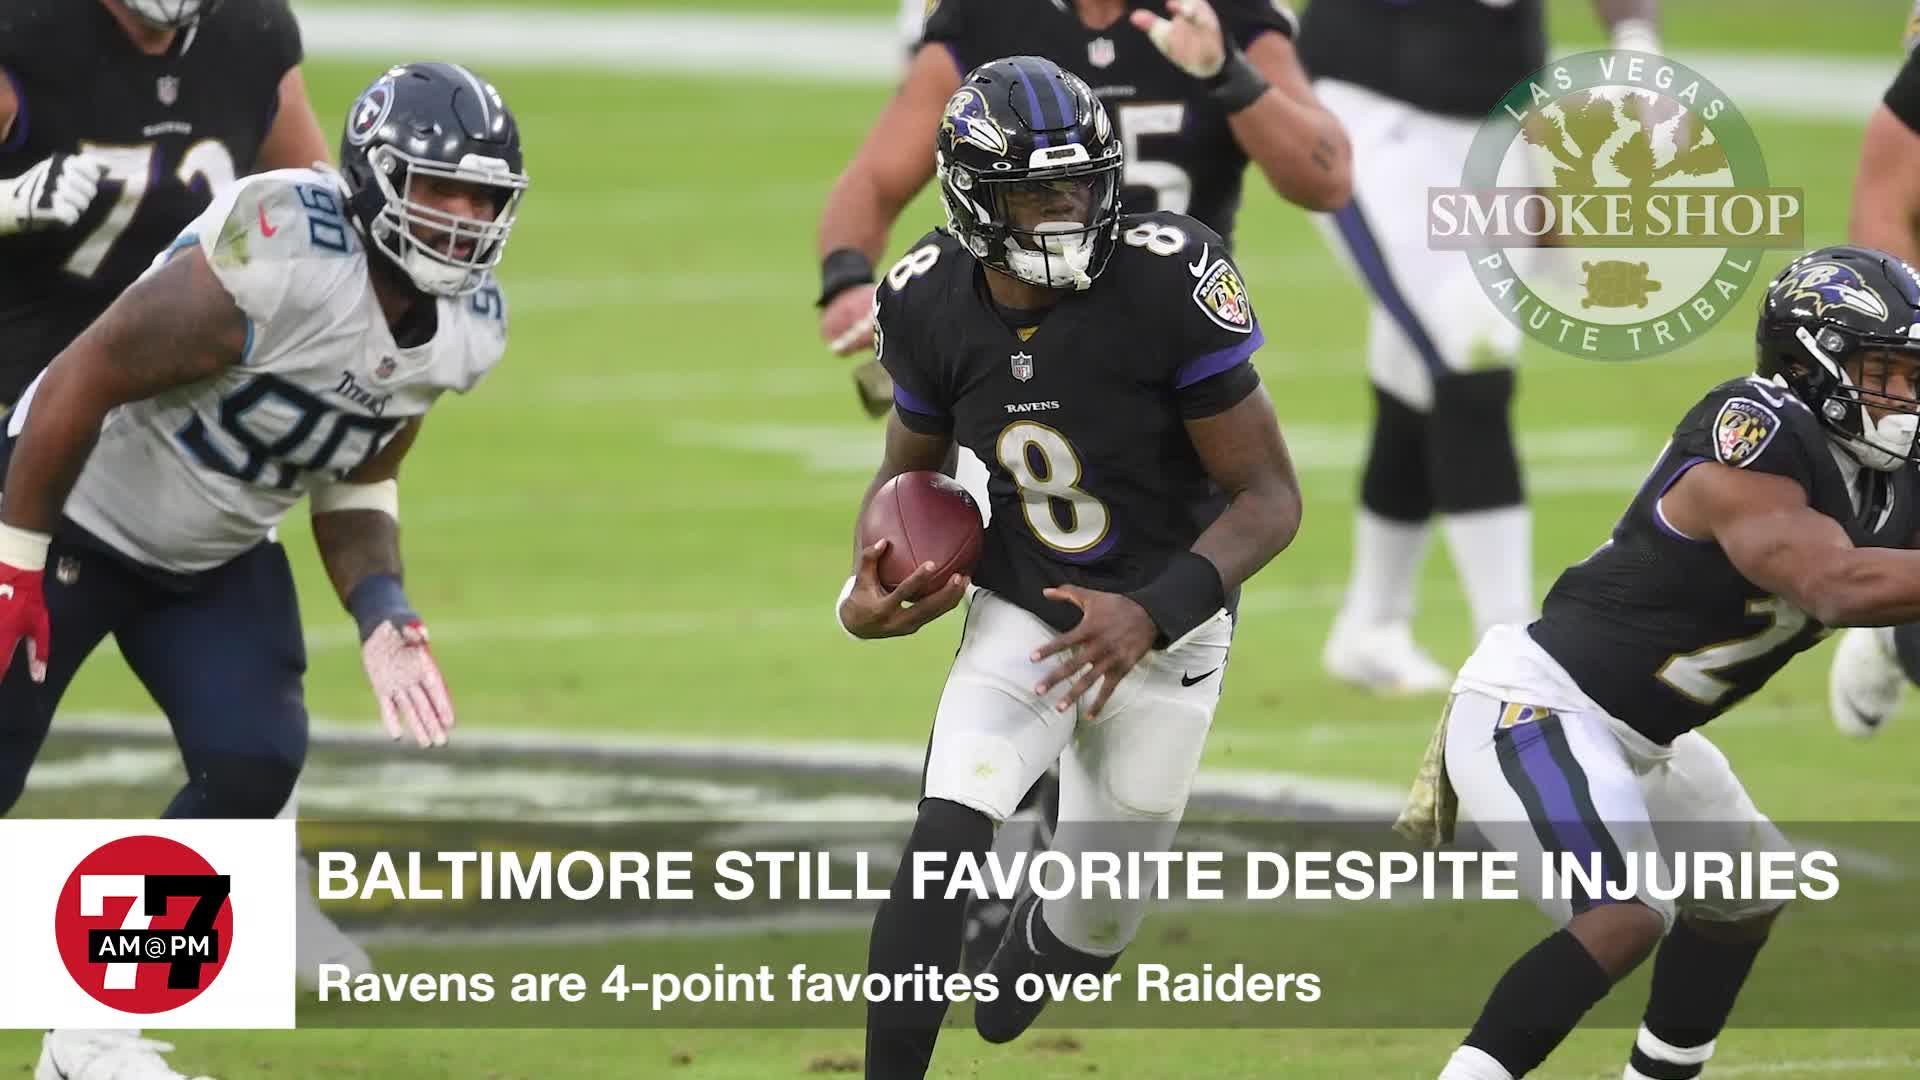 7@7PM Ravens Still Favorites Despite Injuries